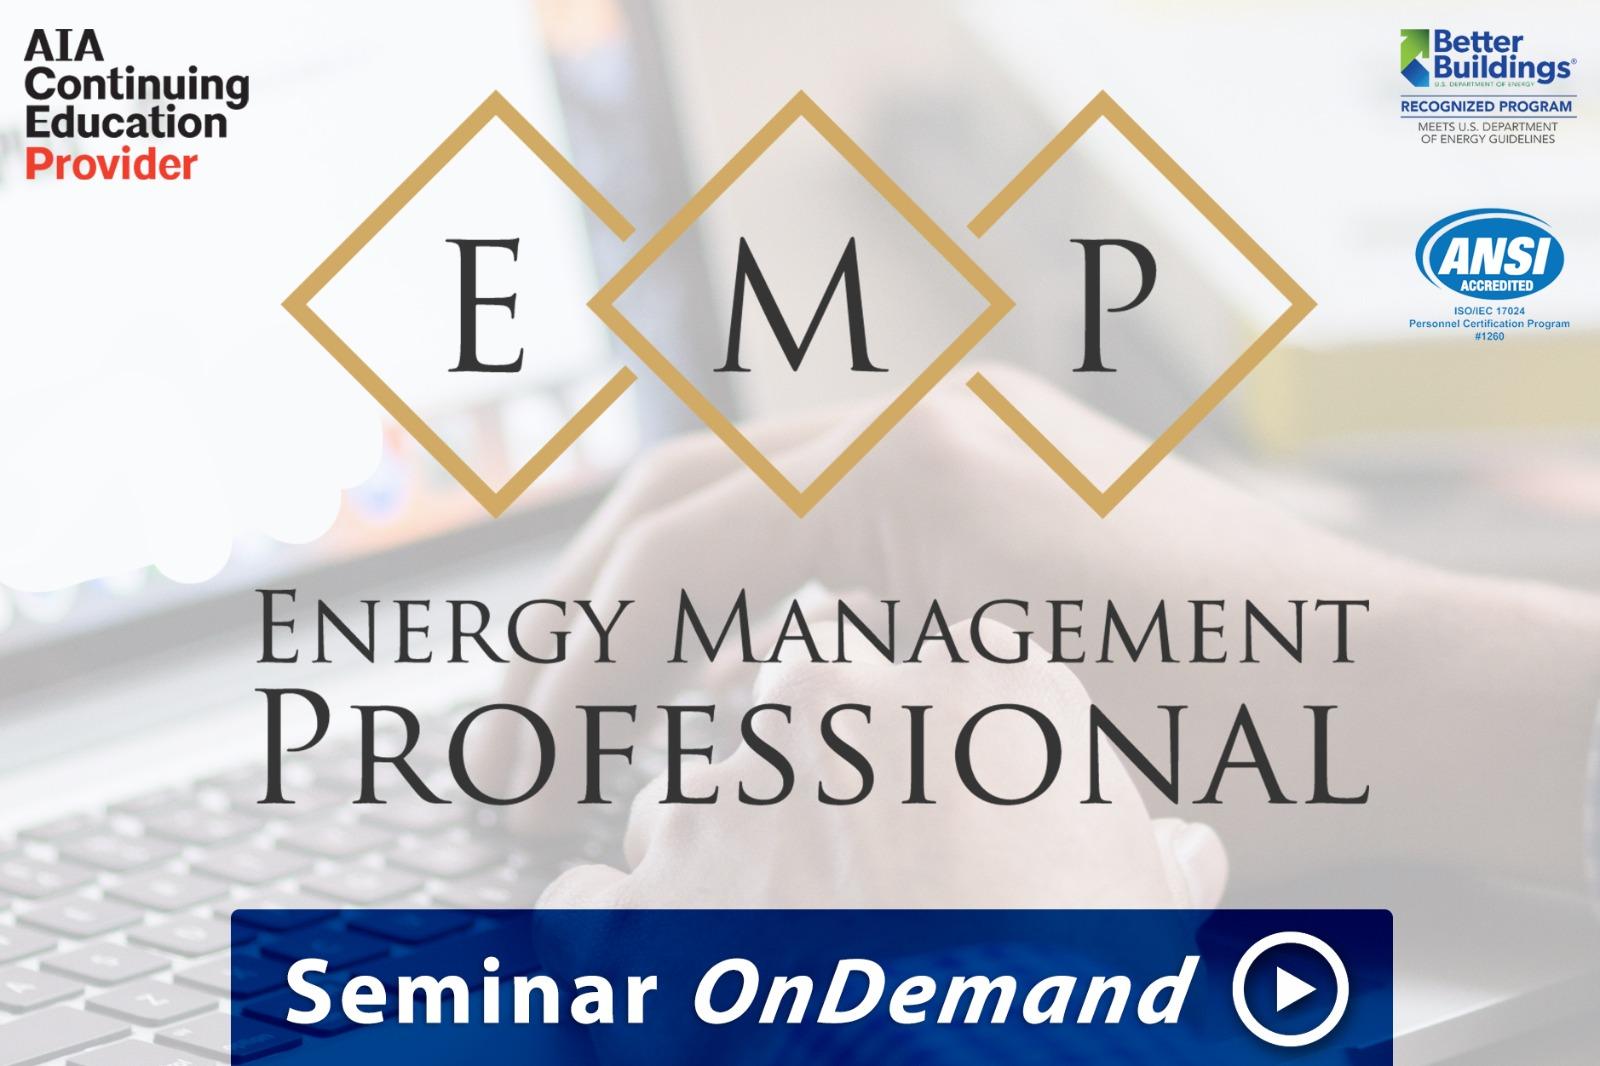 EMP Seminar OnDemand